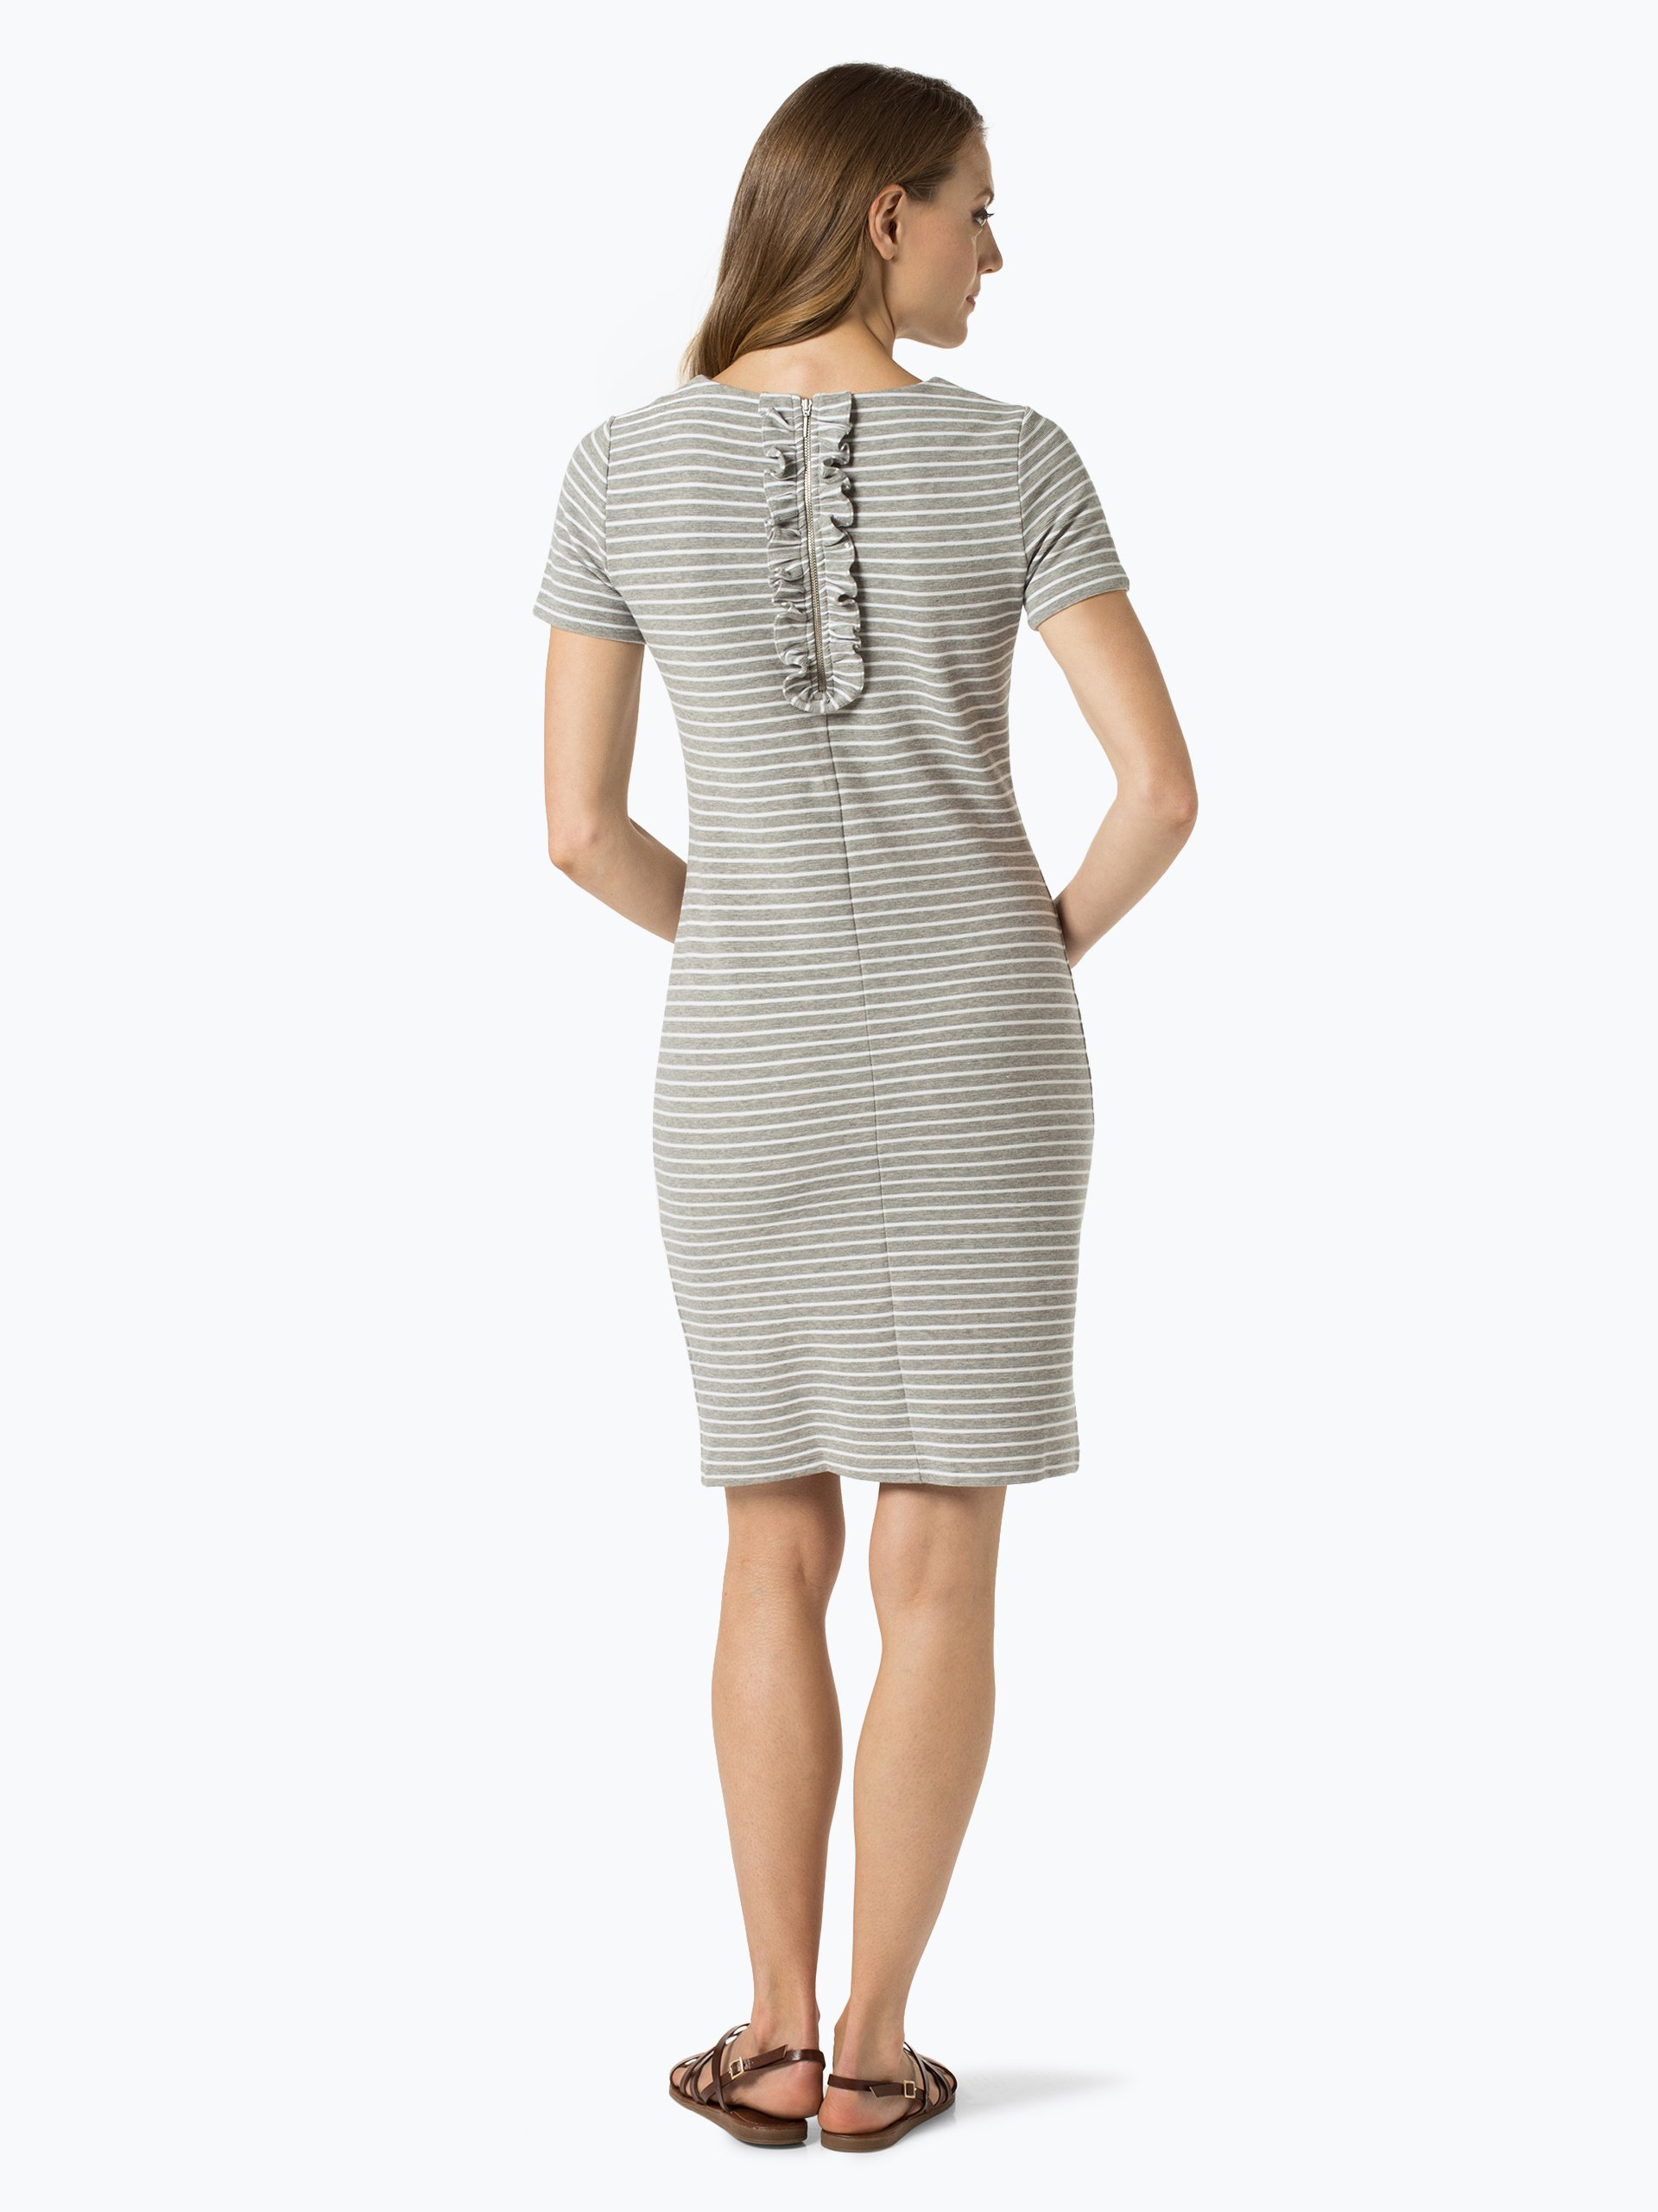 BOSS Casual Damen Kleid - Damarino online kaufen | PEEK ...